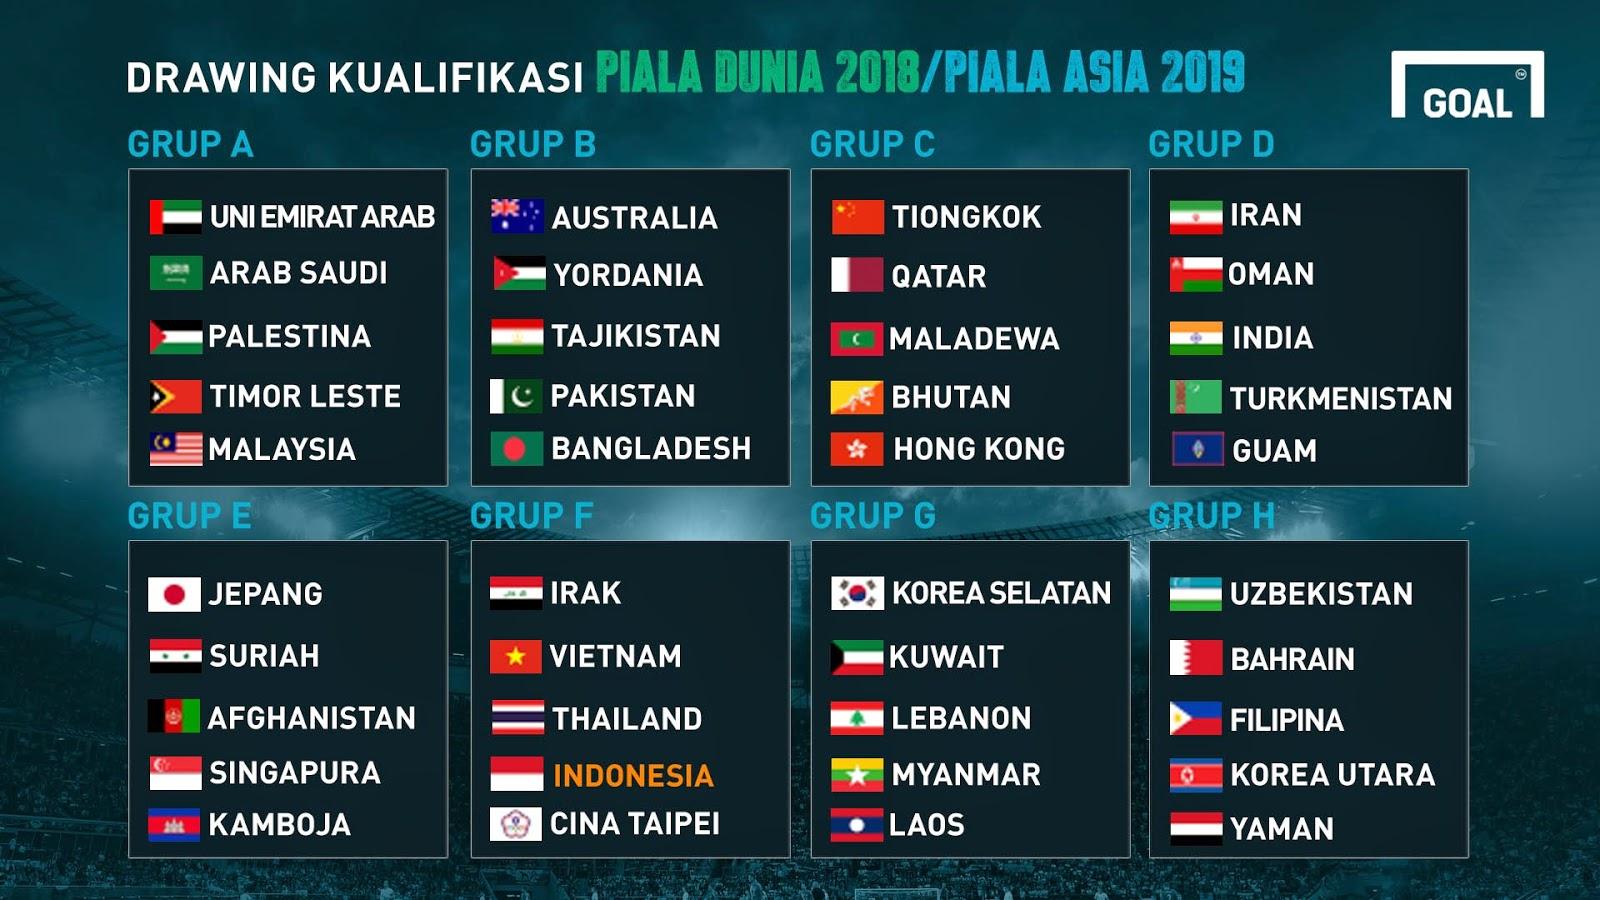 kualifikasi piala dunia foto 2017